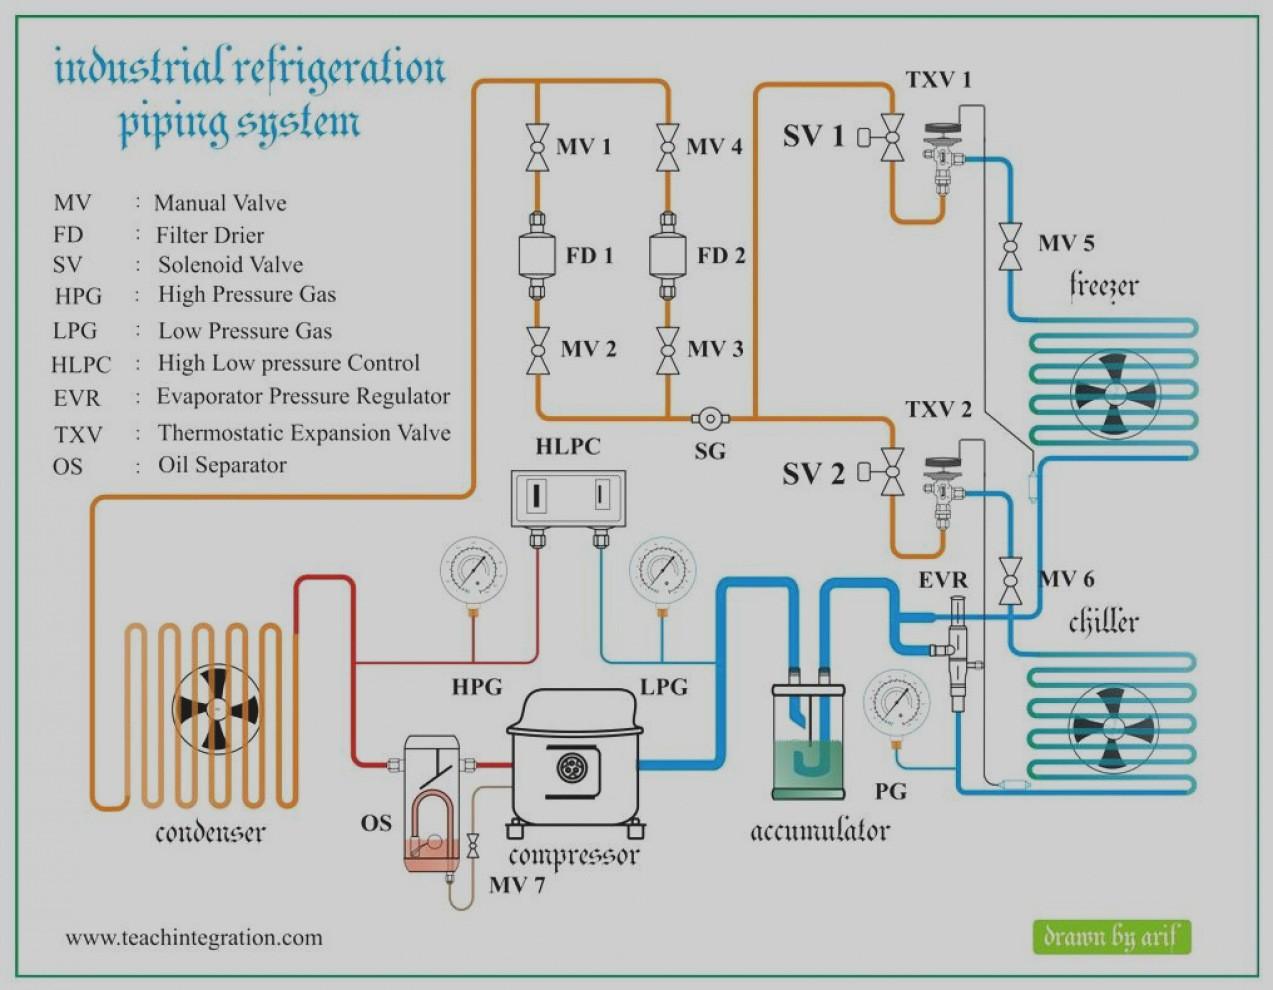 copeland wiring diagram doerr single phase motor for compressor image